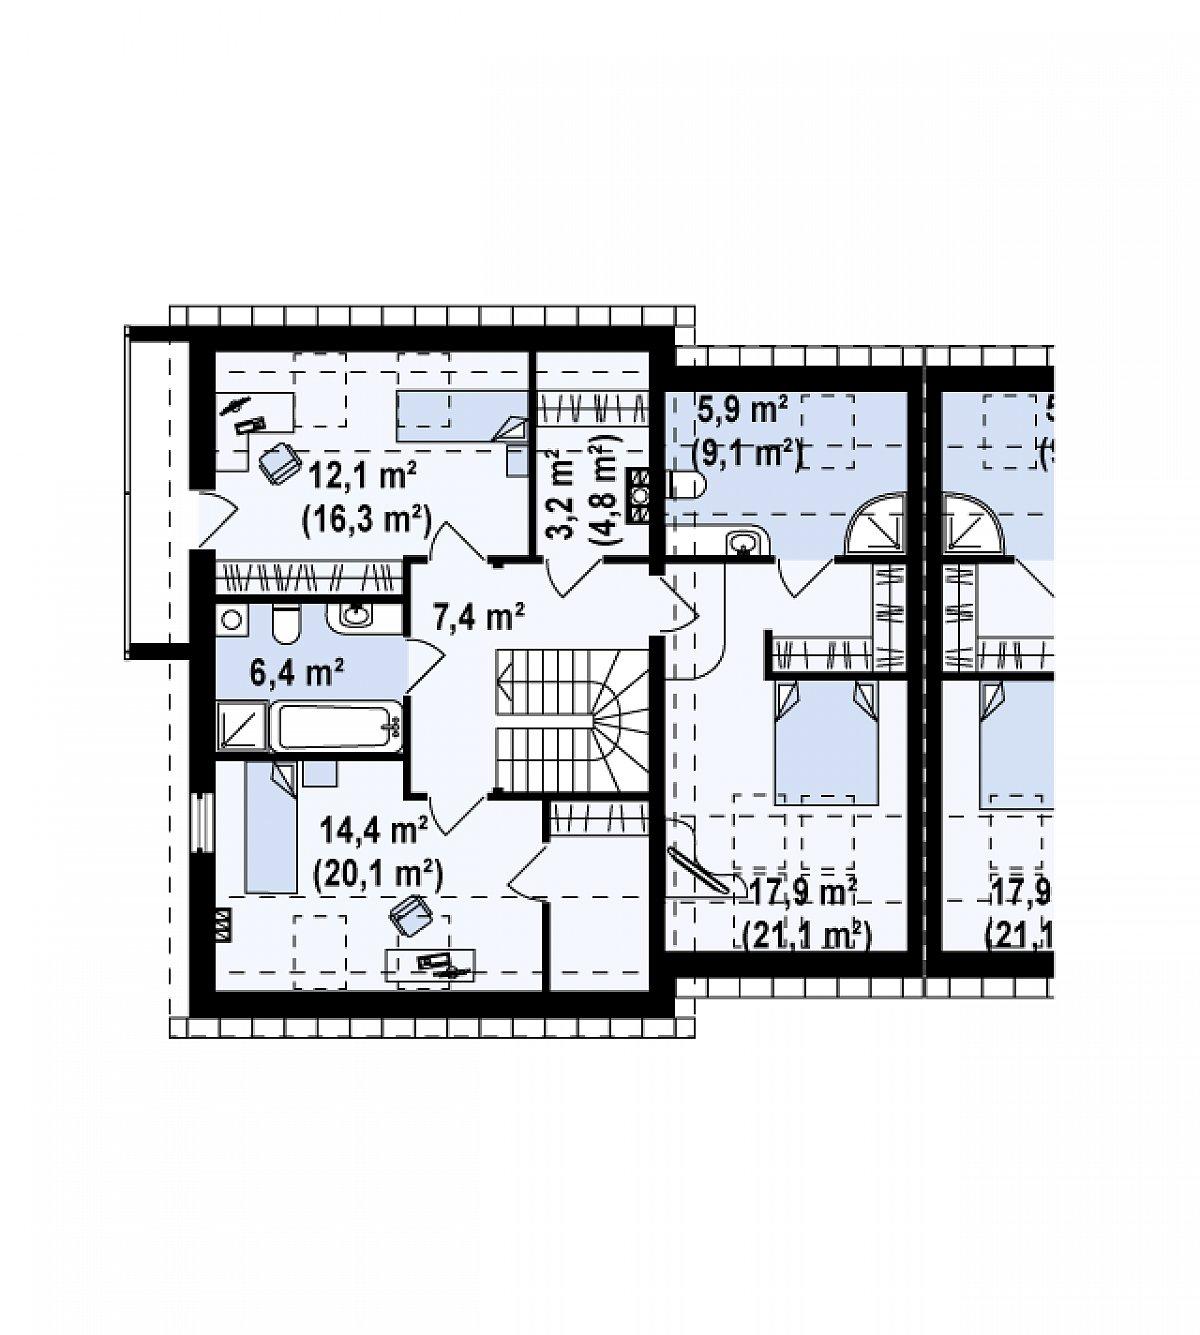 Второй этаж 67,3(85,2м²) дома Zb3